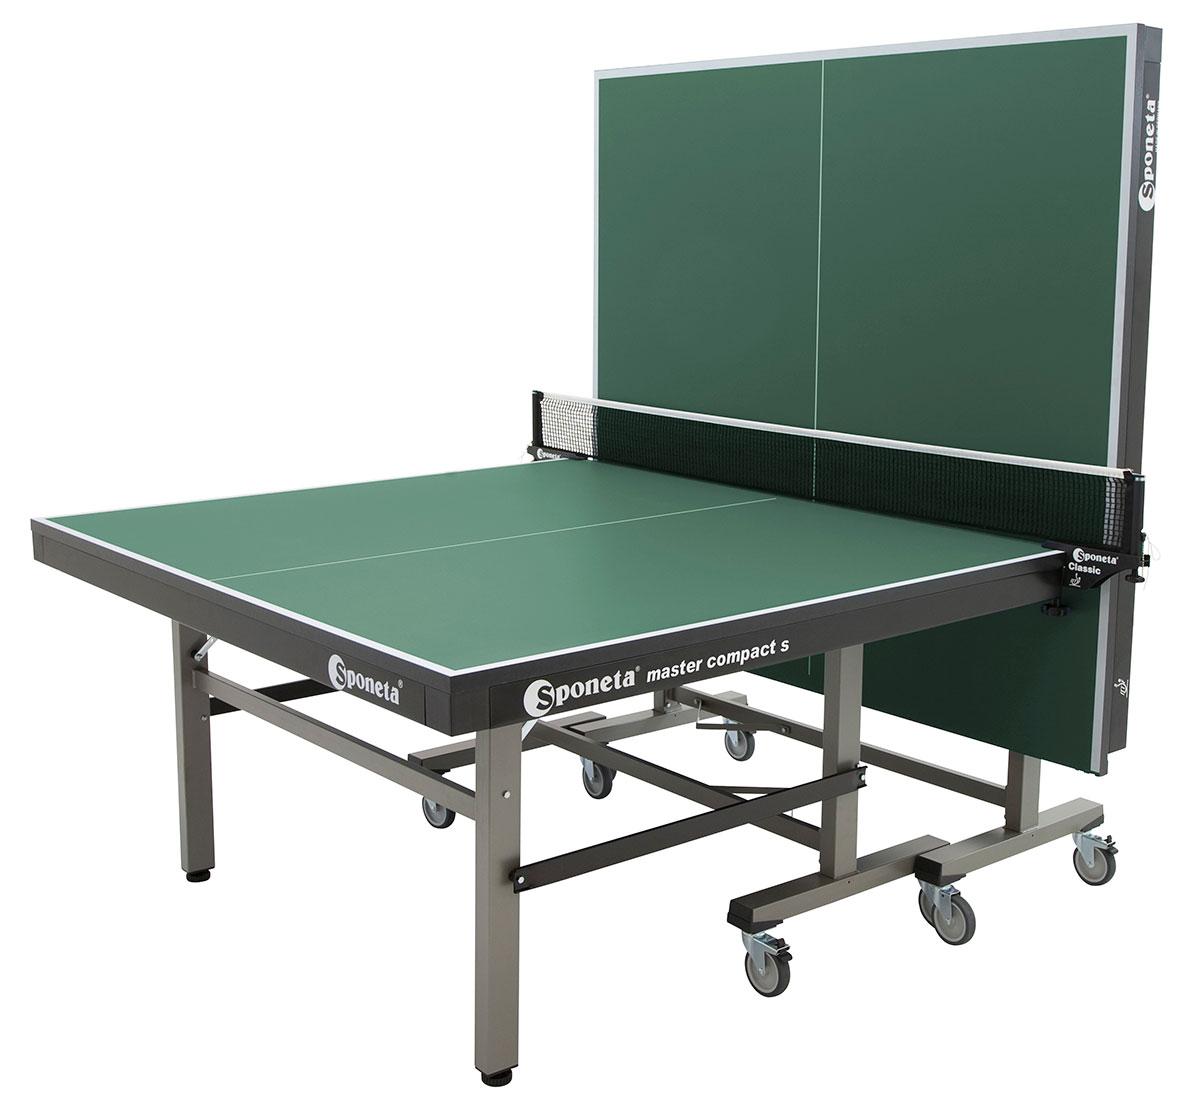 Thorntons table tennistable tennis table sponeta profiline master compact indoor s7 12 - Sponeta table tennis table ...